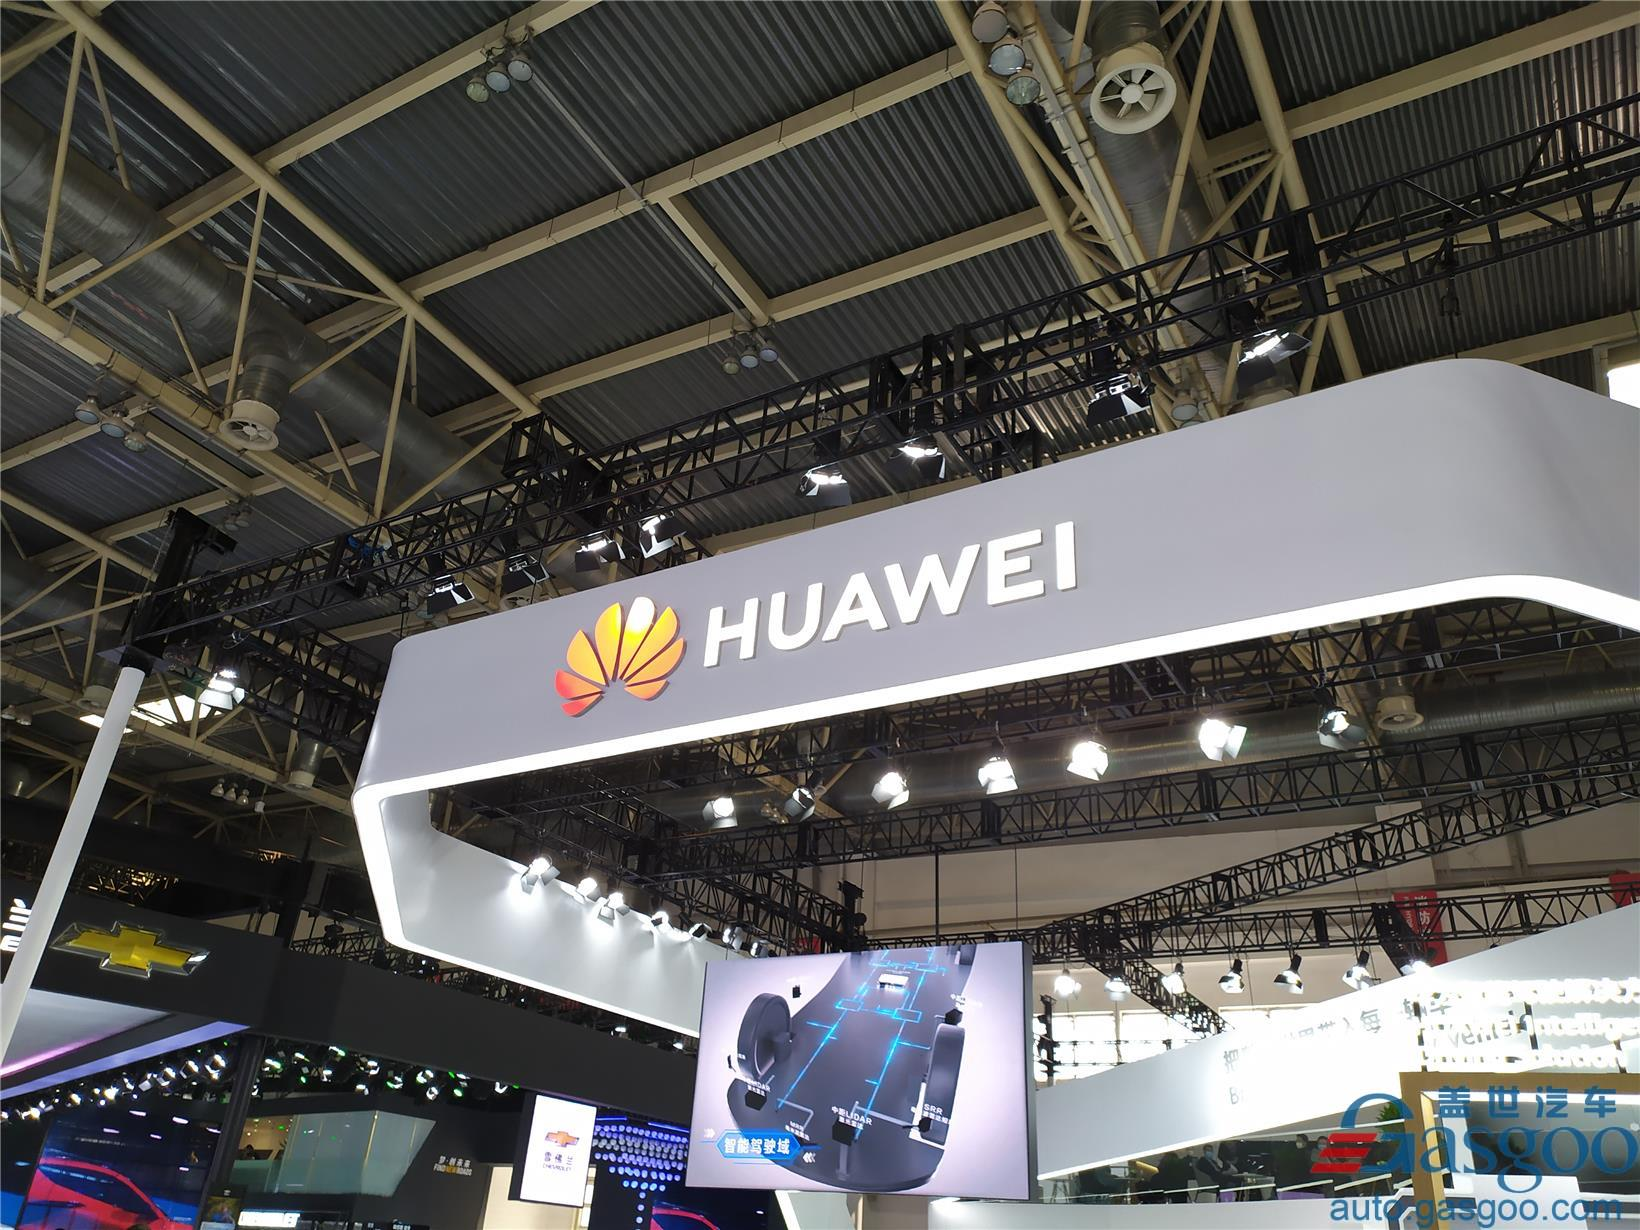 Huawei HiCar BYD, Huawei auto partnership, China automotive news